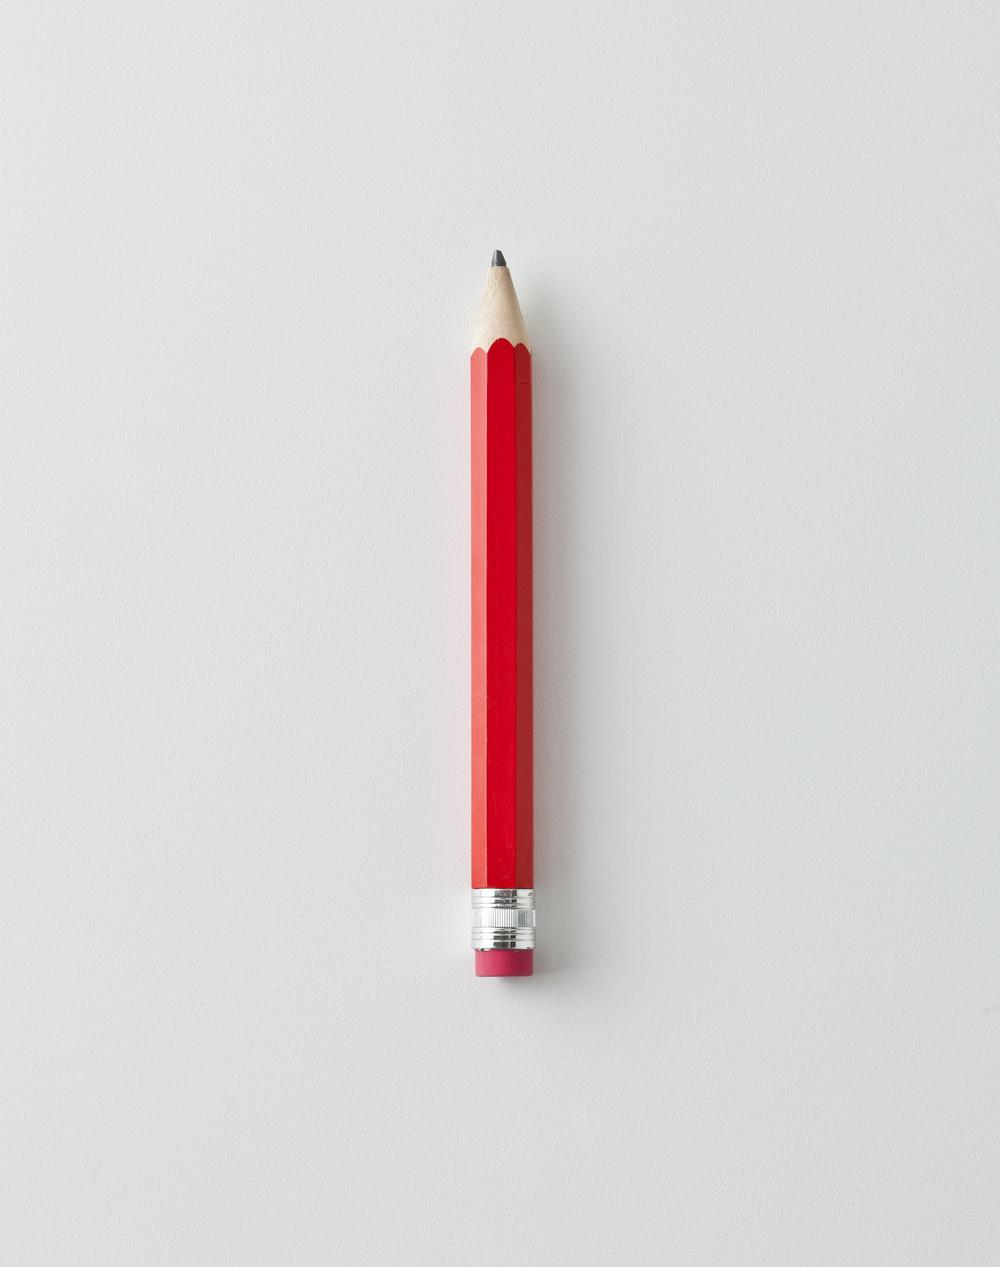 Pencil-073.jpg